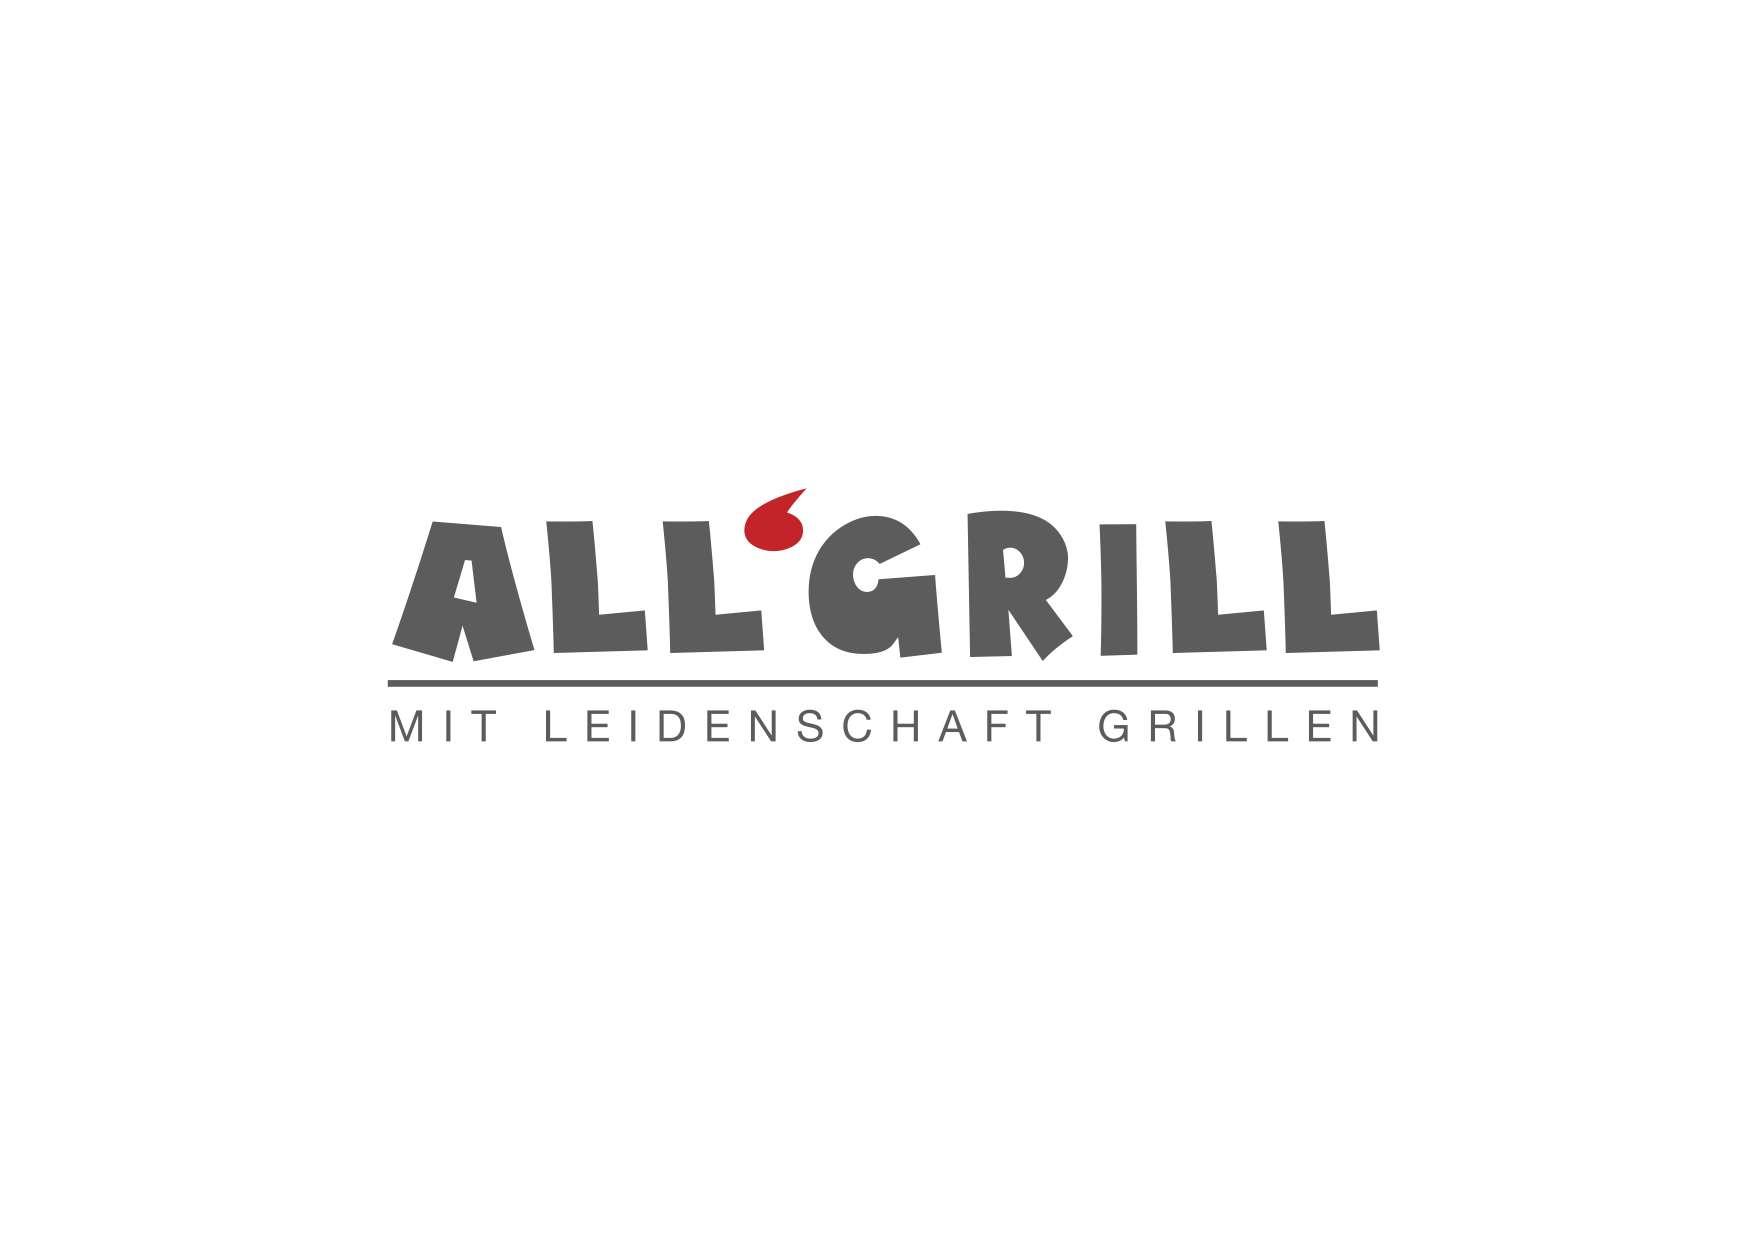 ALLGRILL